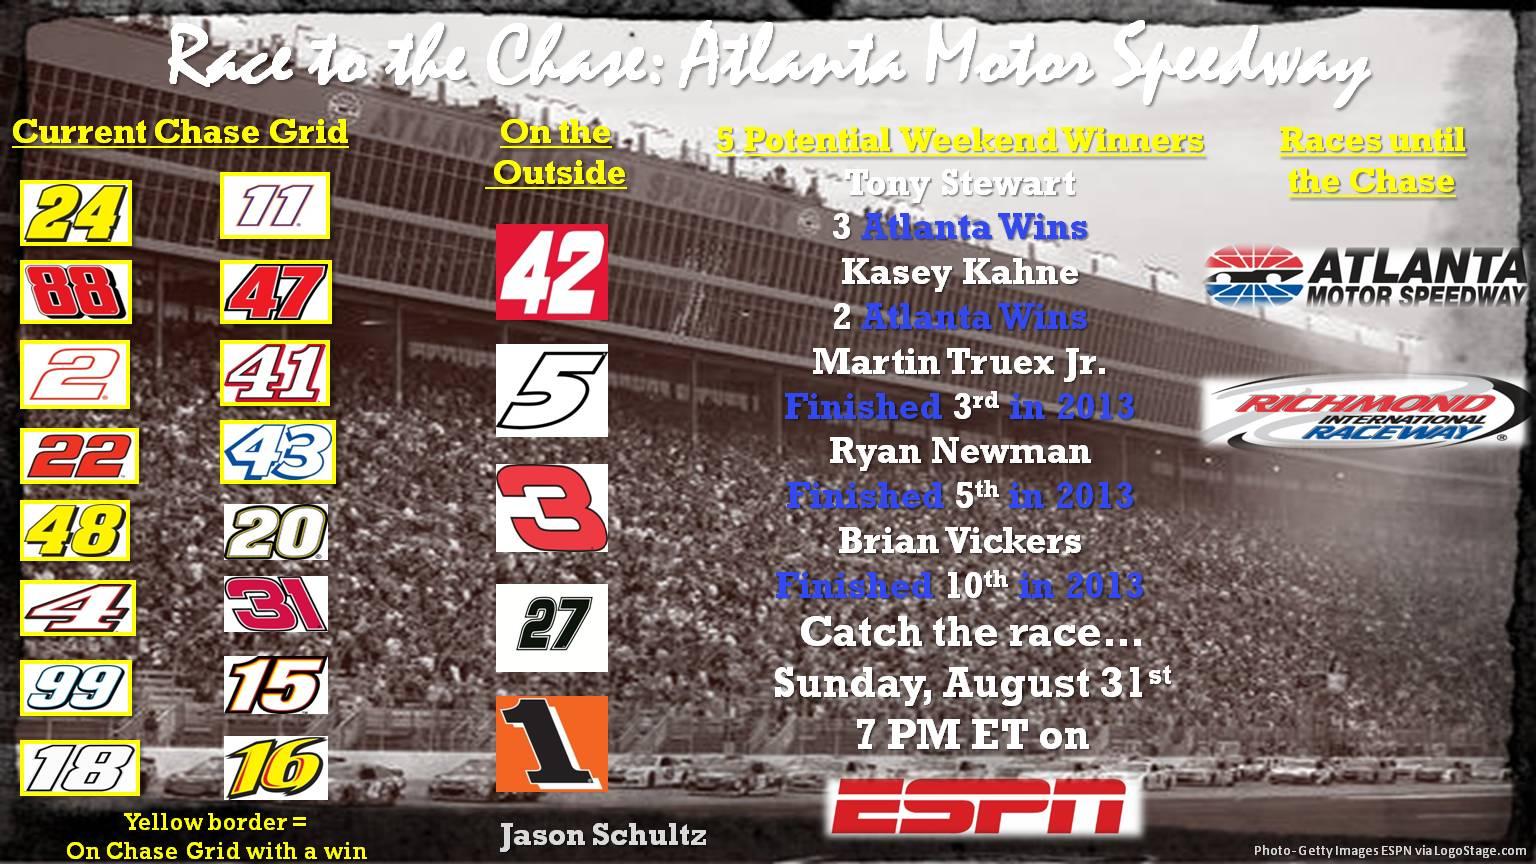 Race To The Chase Atlanta Motor Speedway Jason Schultz